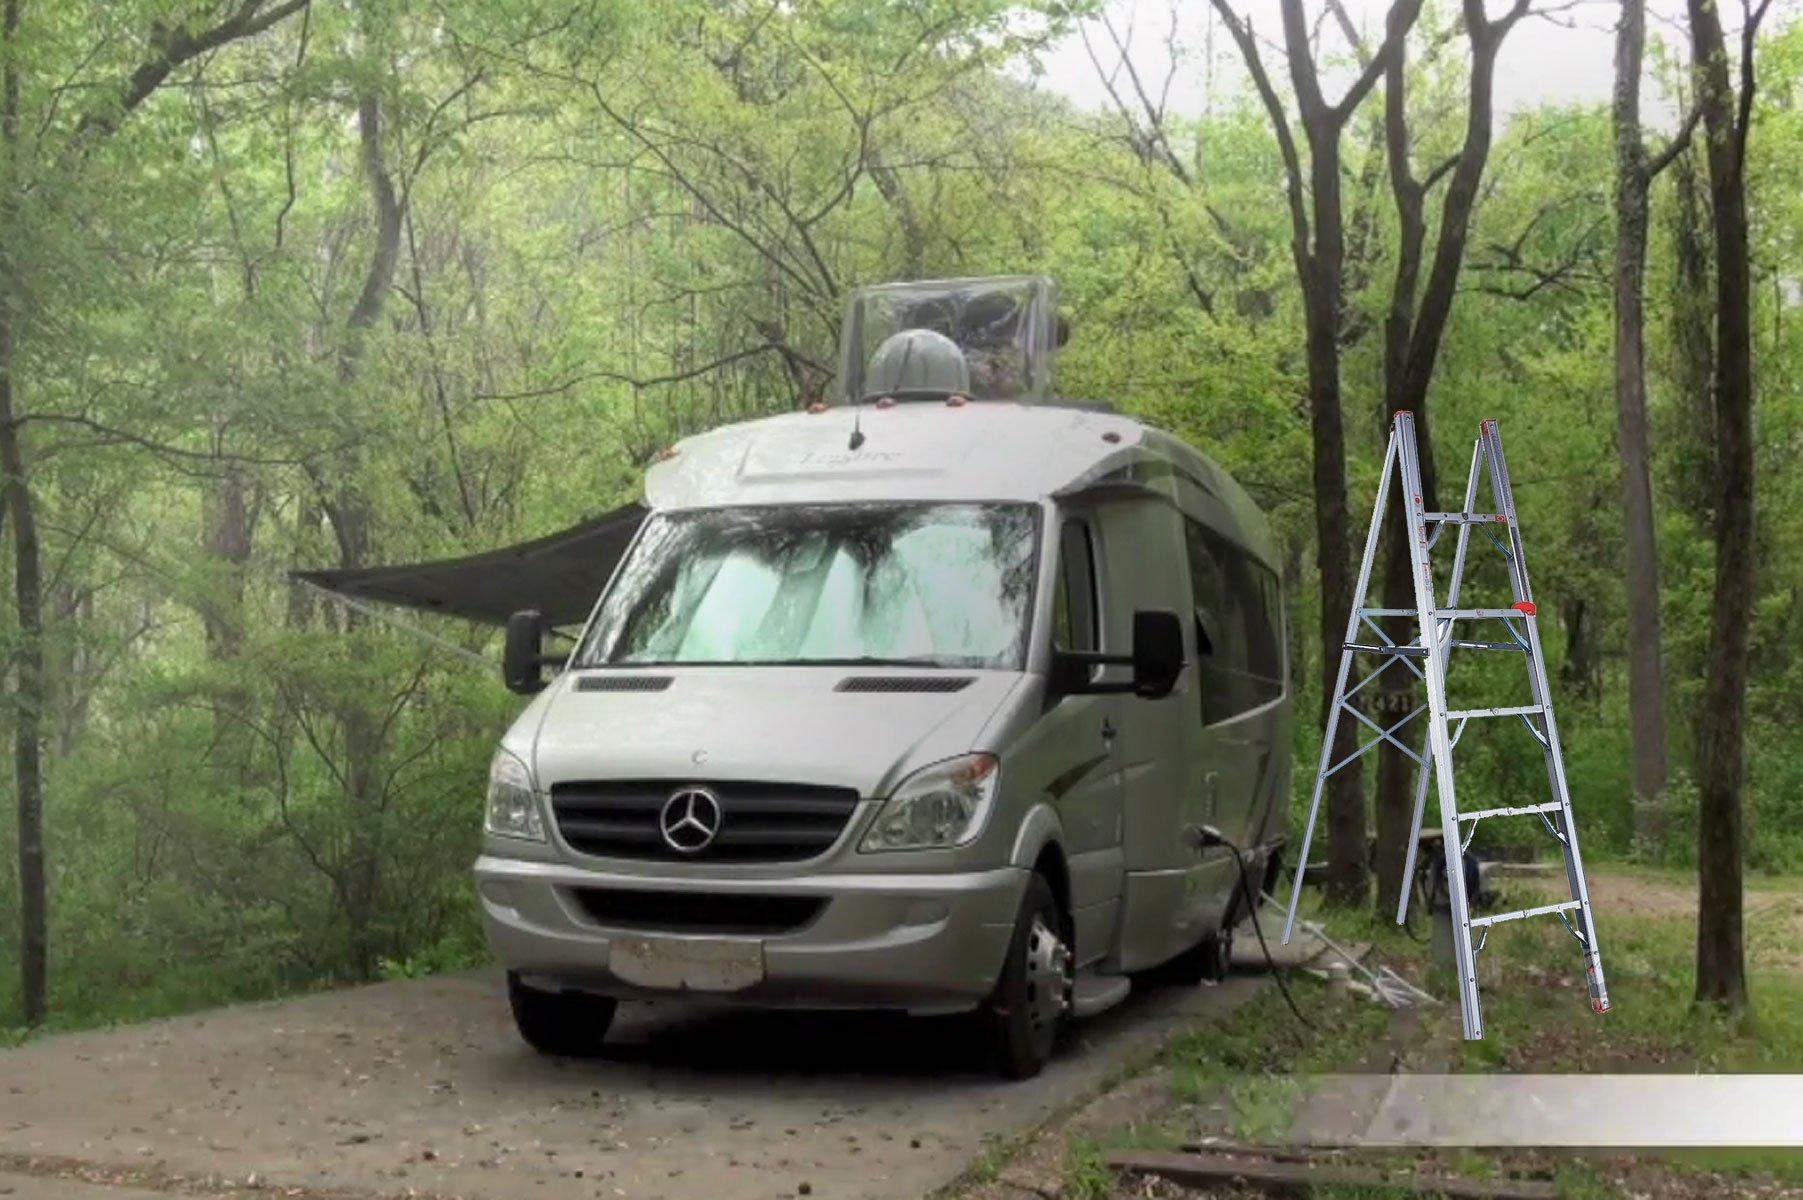 Unity U24ib One Year On Leisure Travel Vans